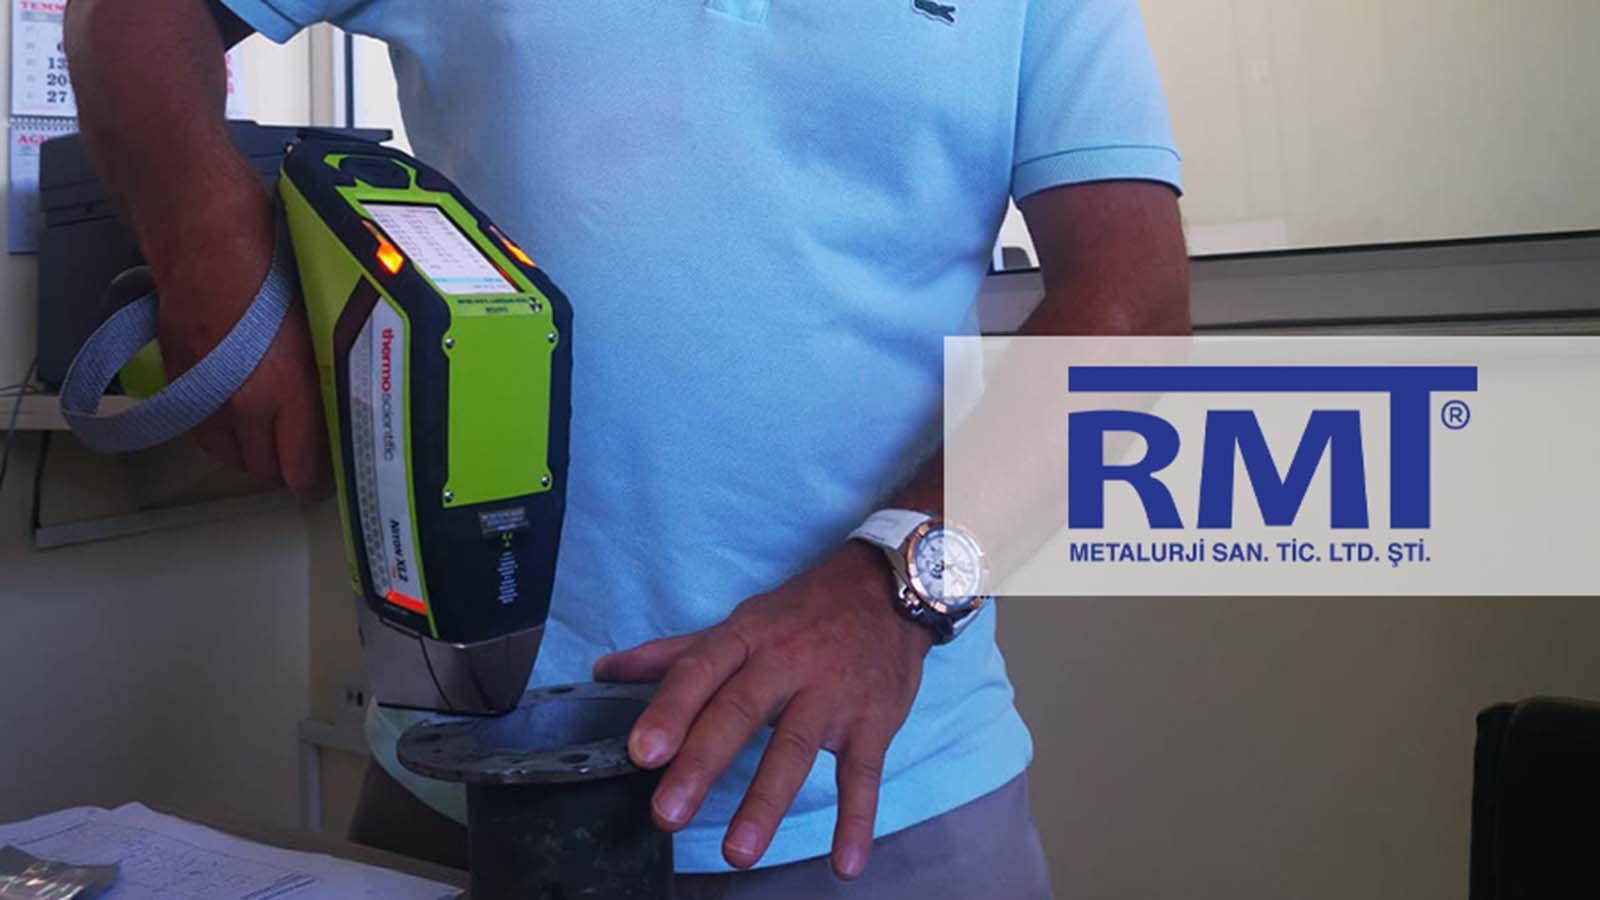 RMT Metalurji, Malzeme Ön Kontrollerini ABD Üretimli Thermo Scientific Niton XL2 980 Plus Taşınabilir XRF Analiz Cihazıyla Yapmaya Başladı!